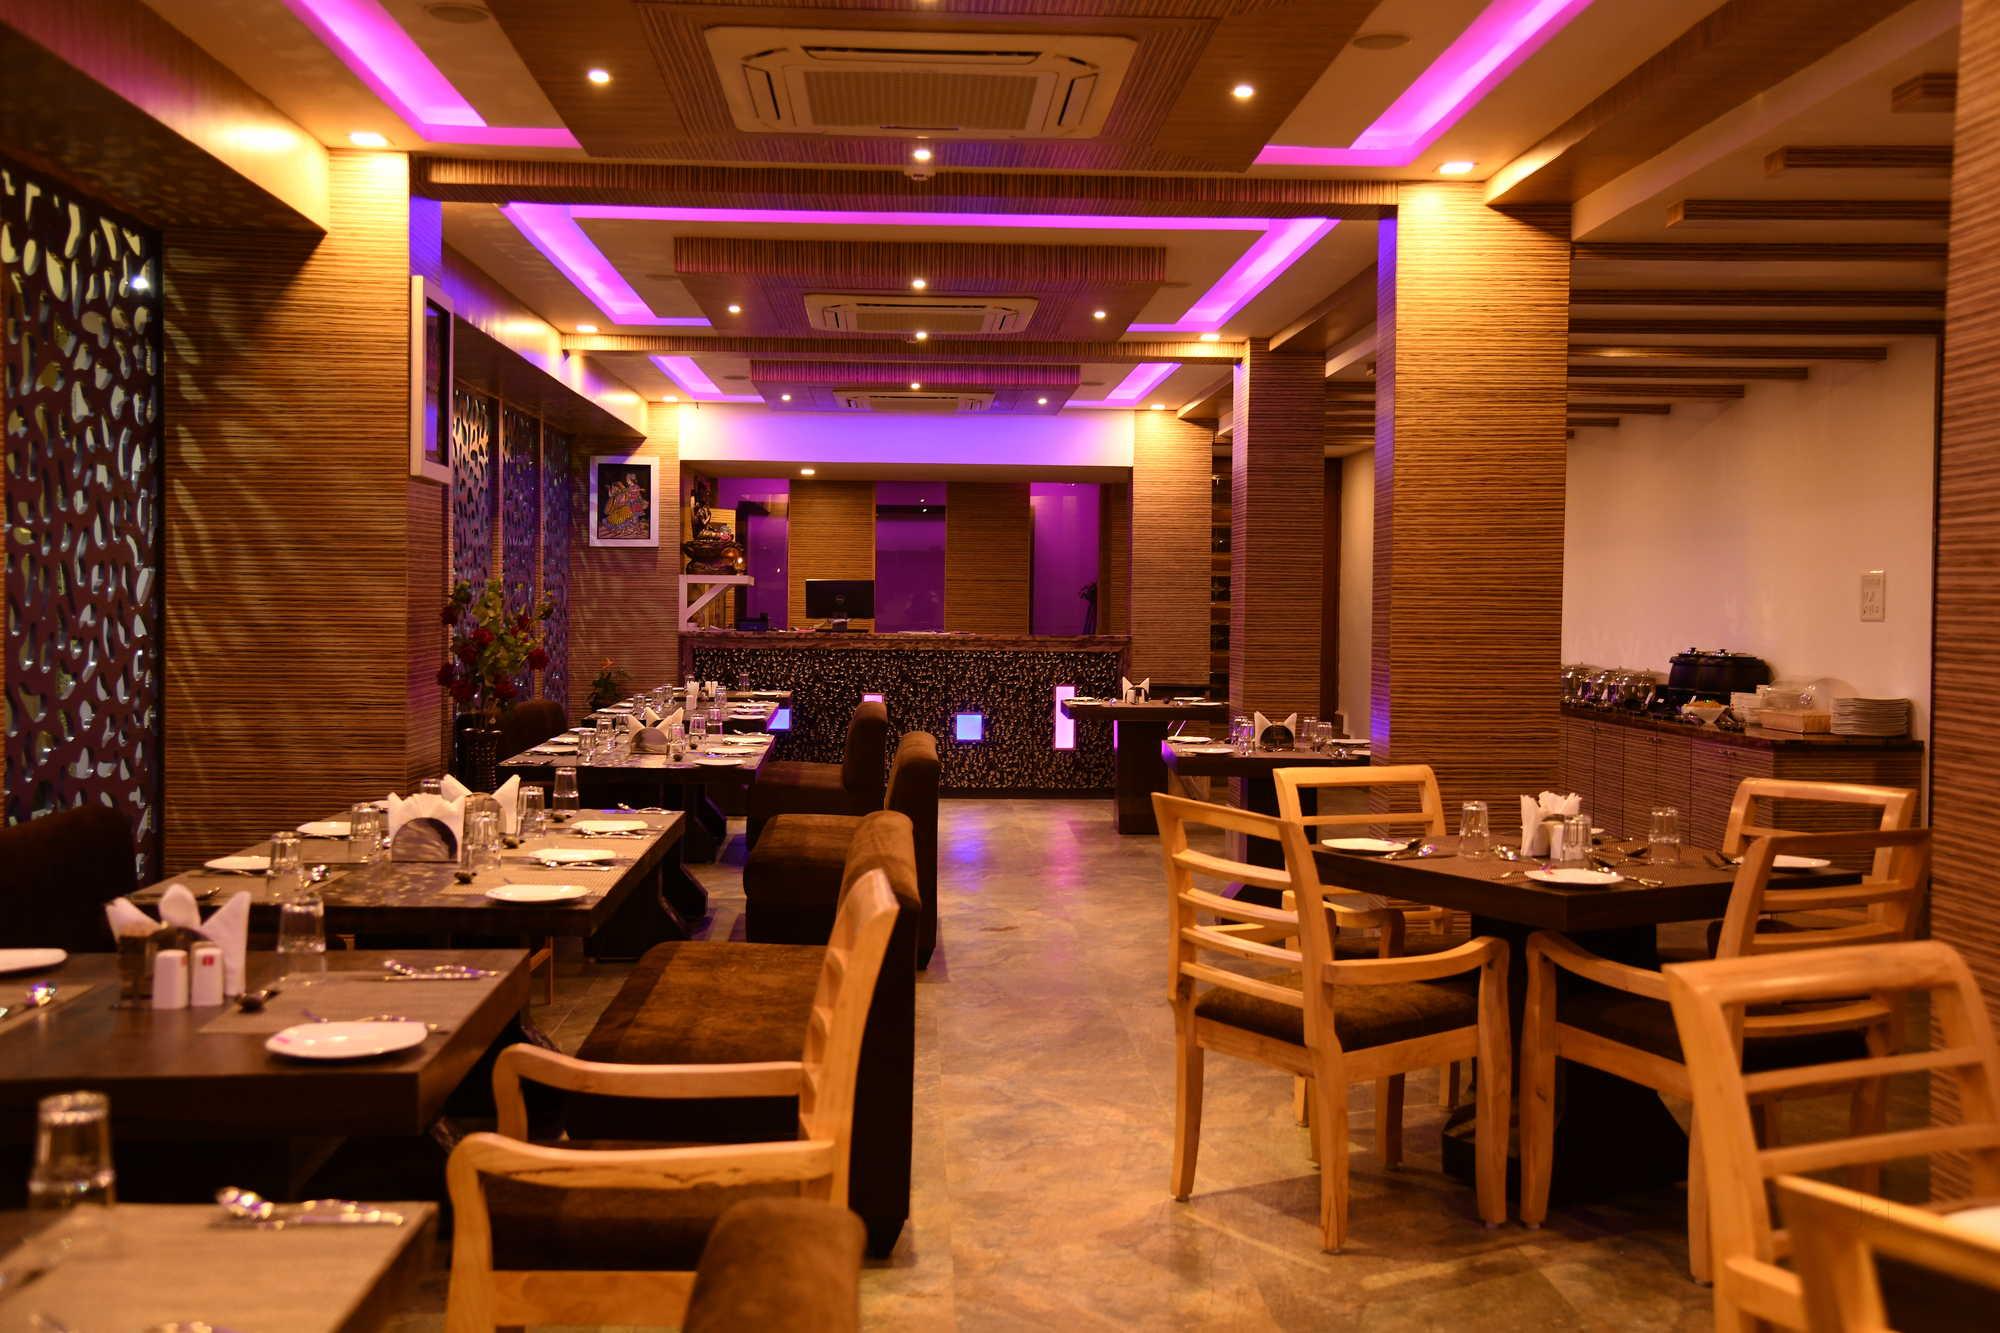 lords-eco-inn-hotel-nayandahalli-bangalore-hotel-reservations-4zxwp